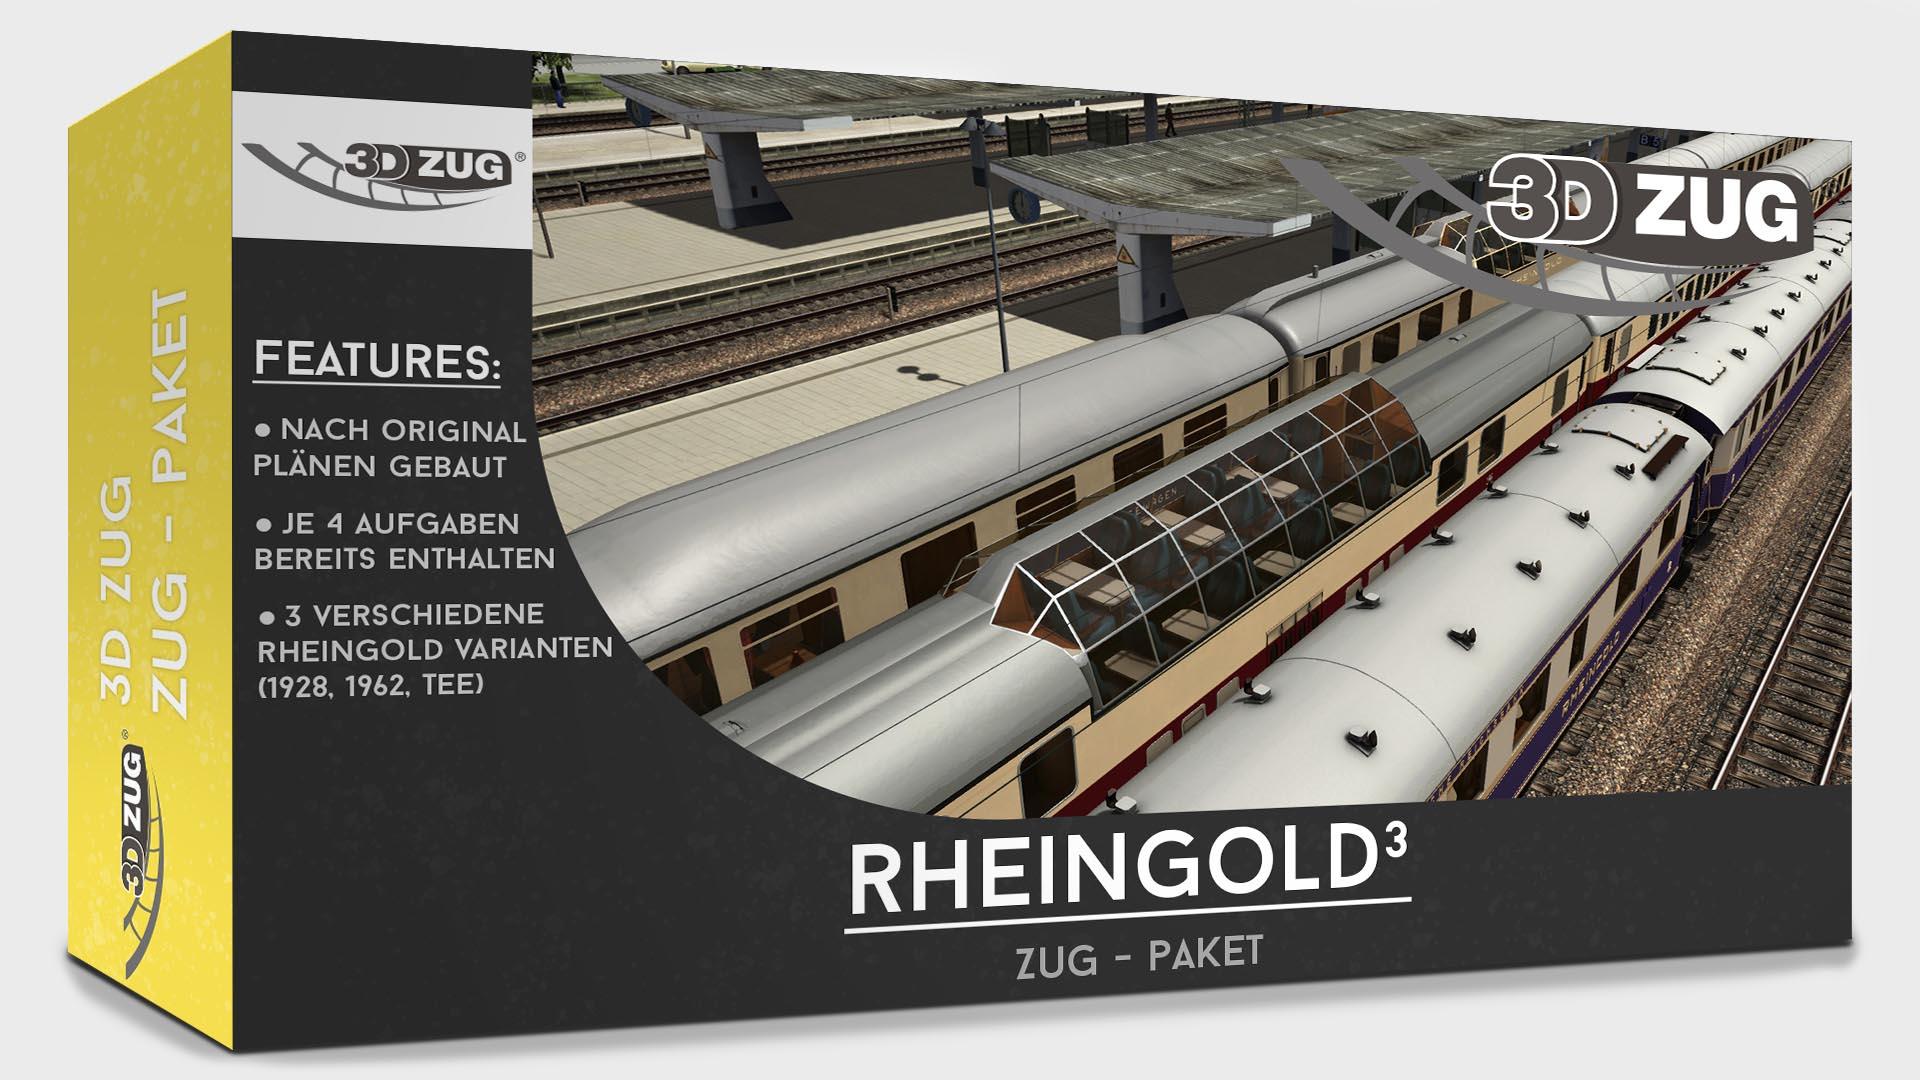 Rheingold ³